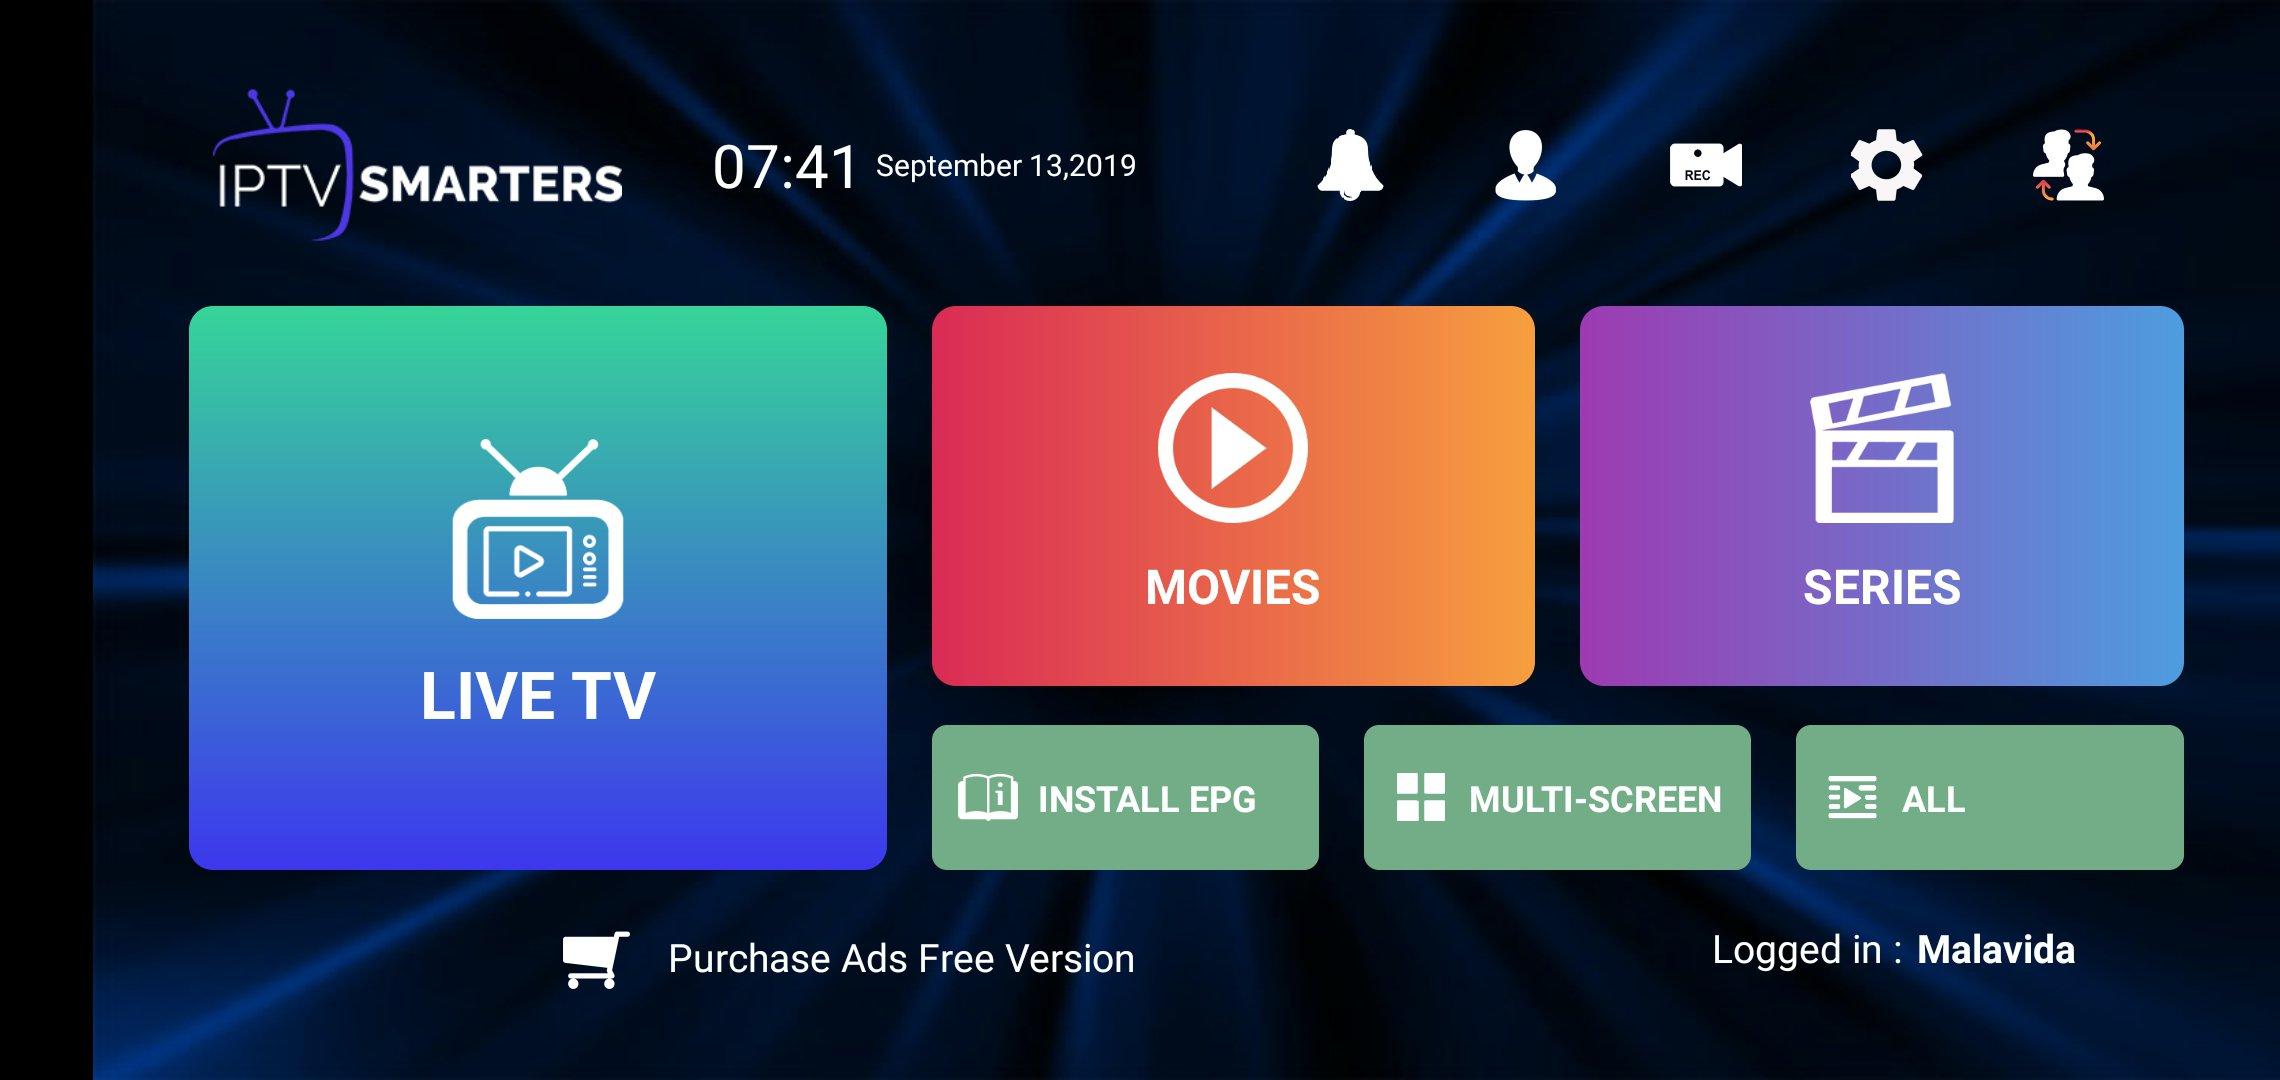 Come installare Iptv Smarters su Samsung